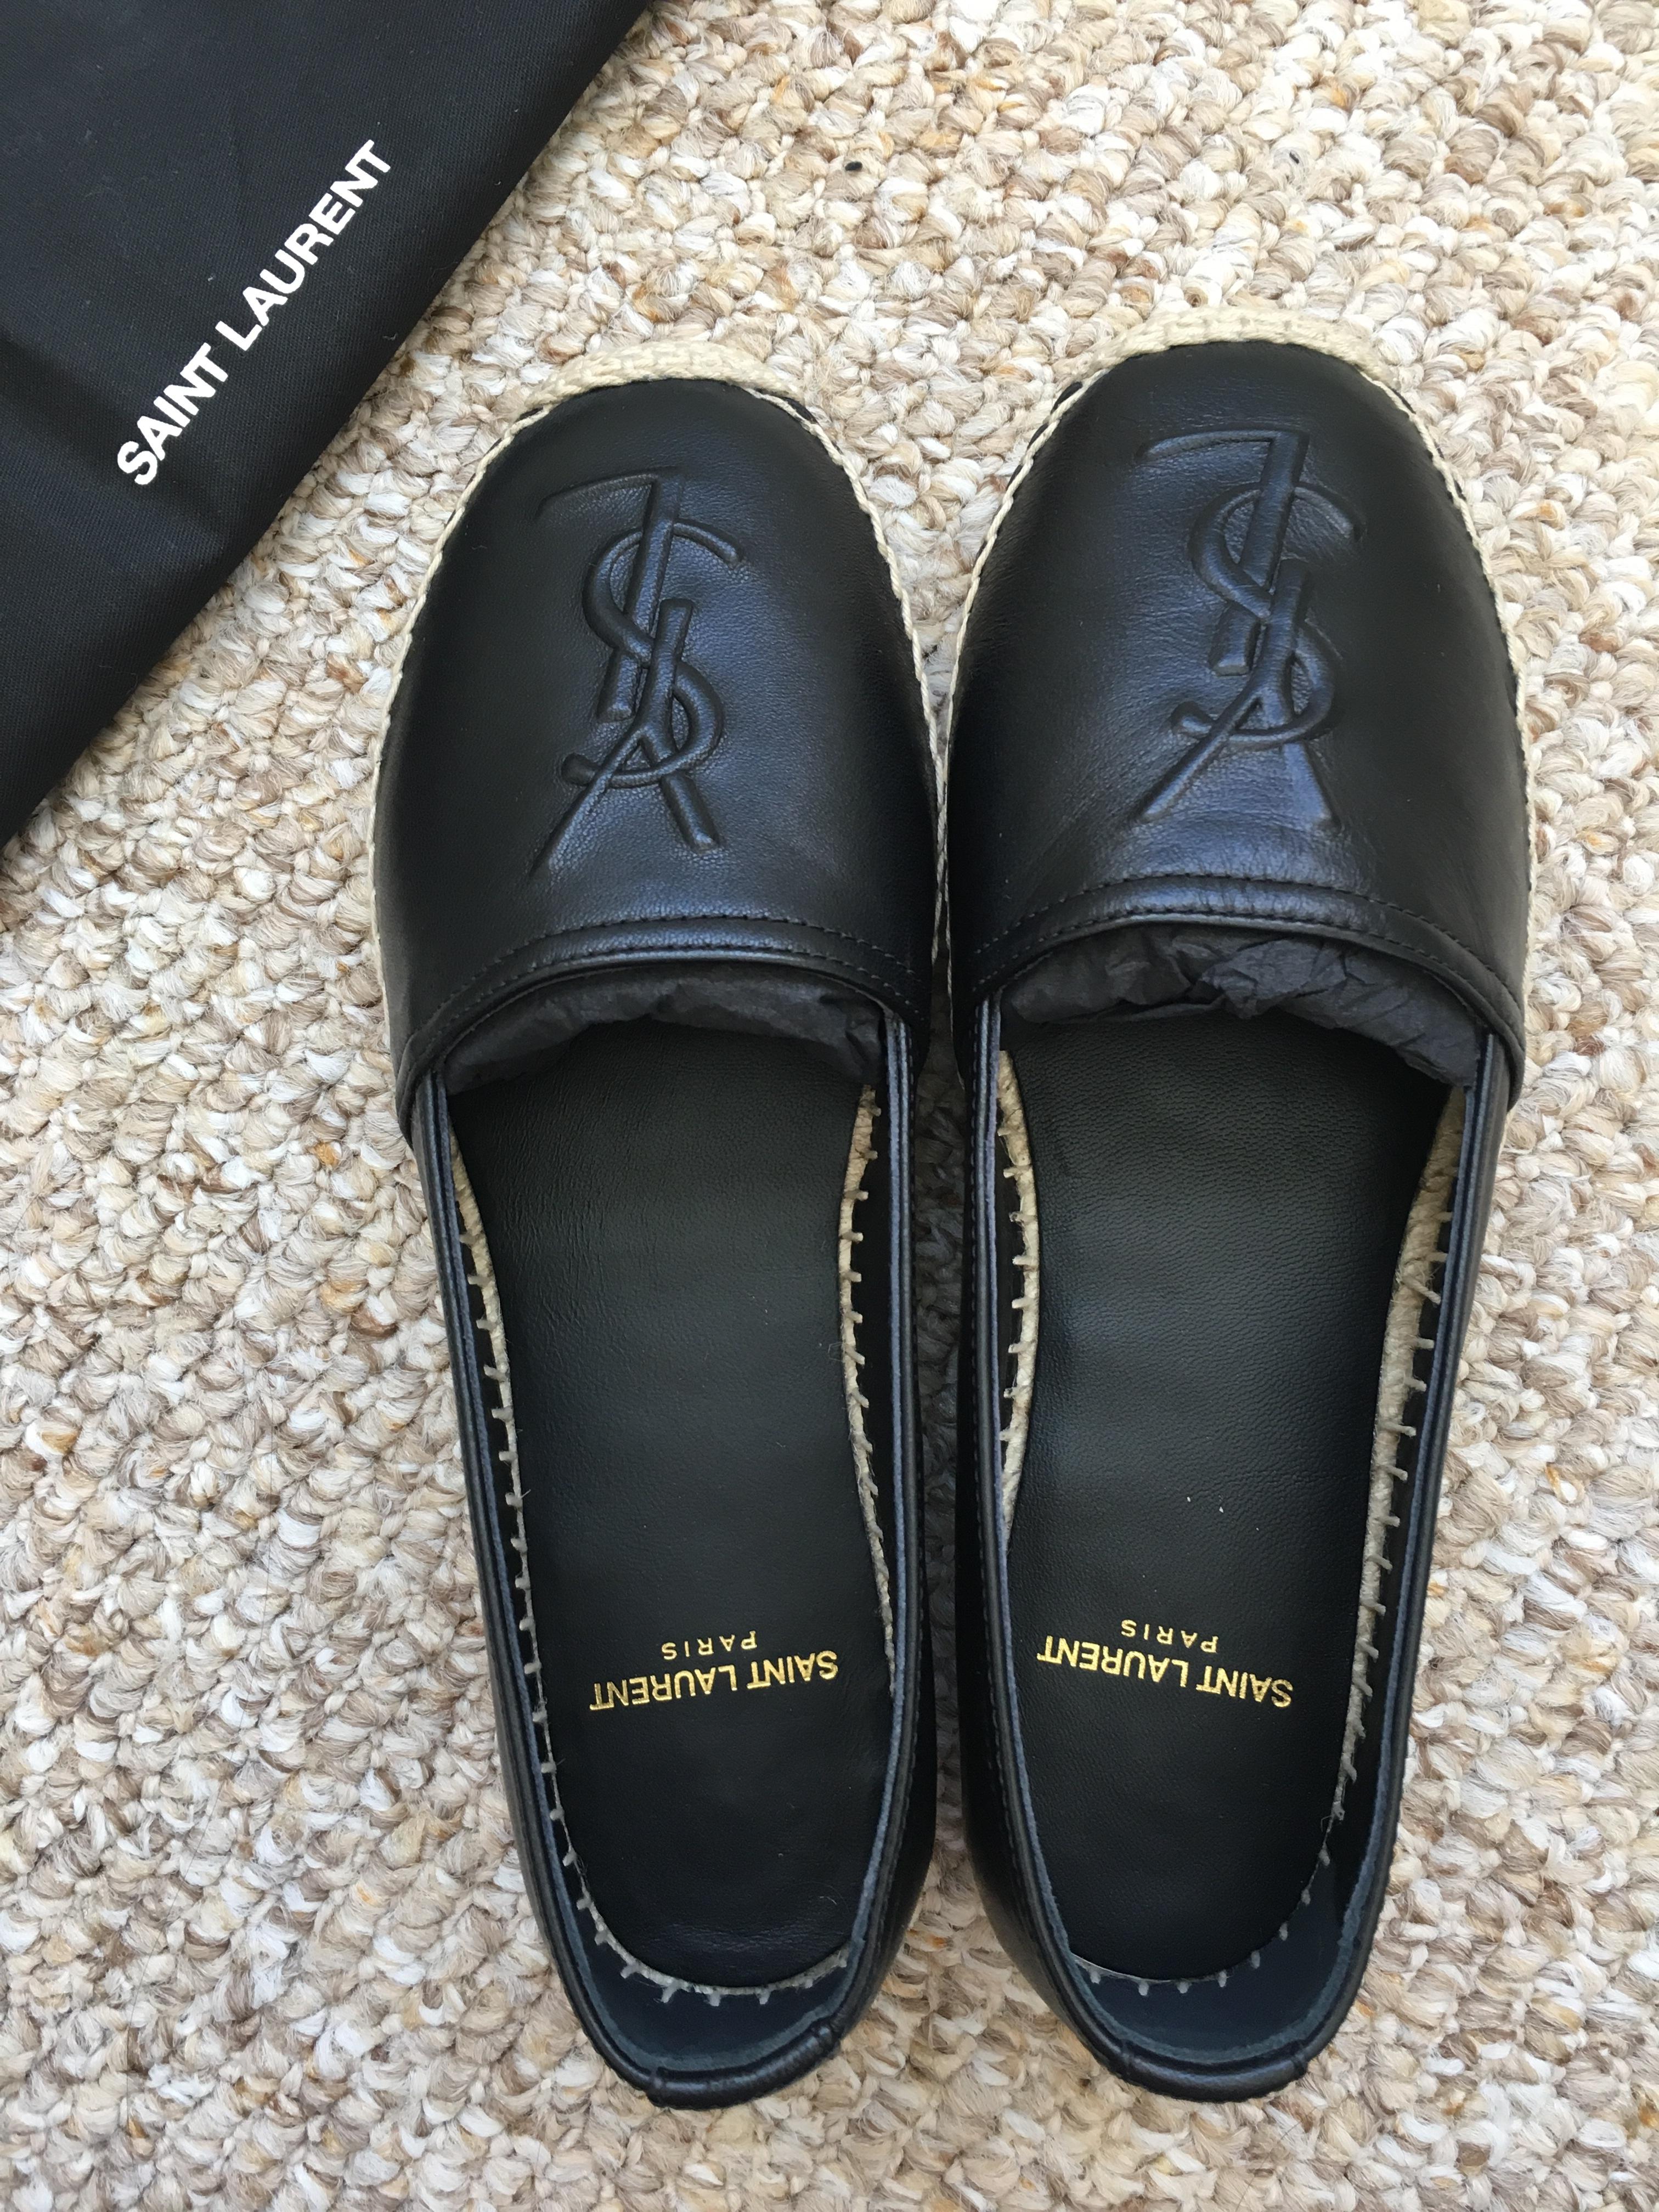 YSL Espadrilles in Black Leather